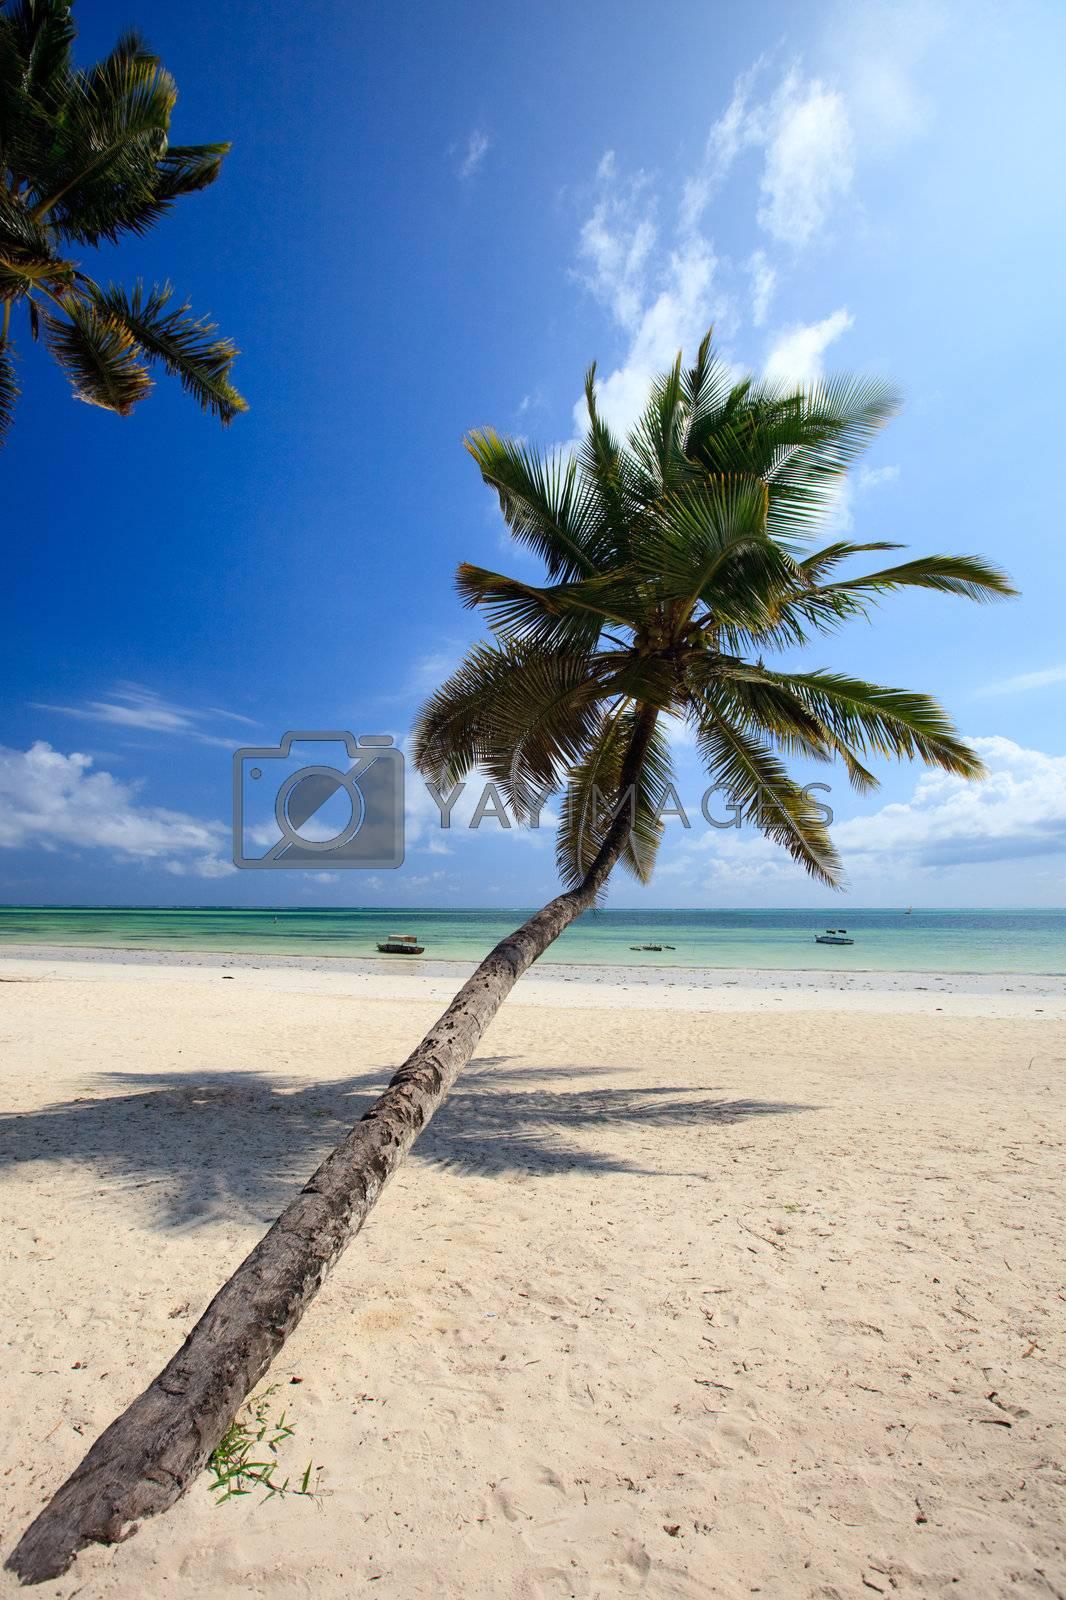 White sand tropical beach with palm trees on east coast of Zanzibar island